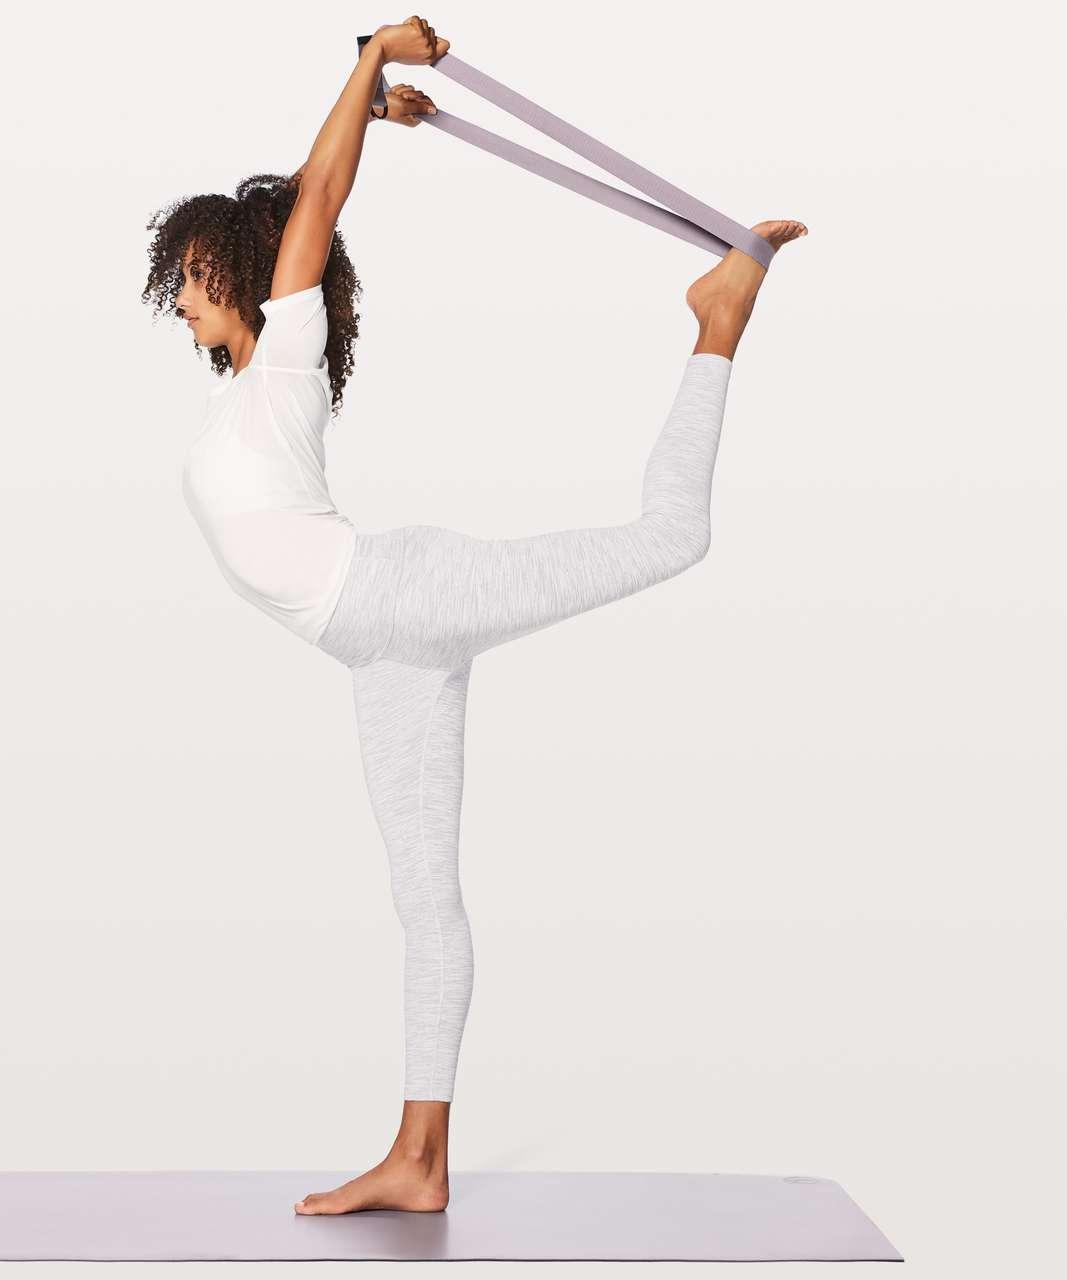 Lululemon No Limits Stretching Strap - Dusty Dawn